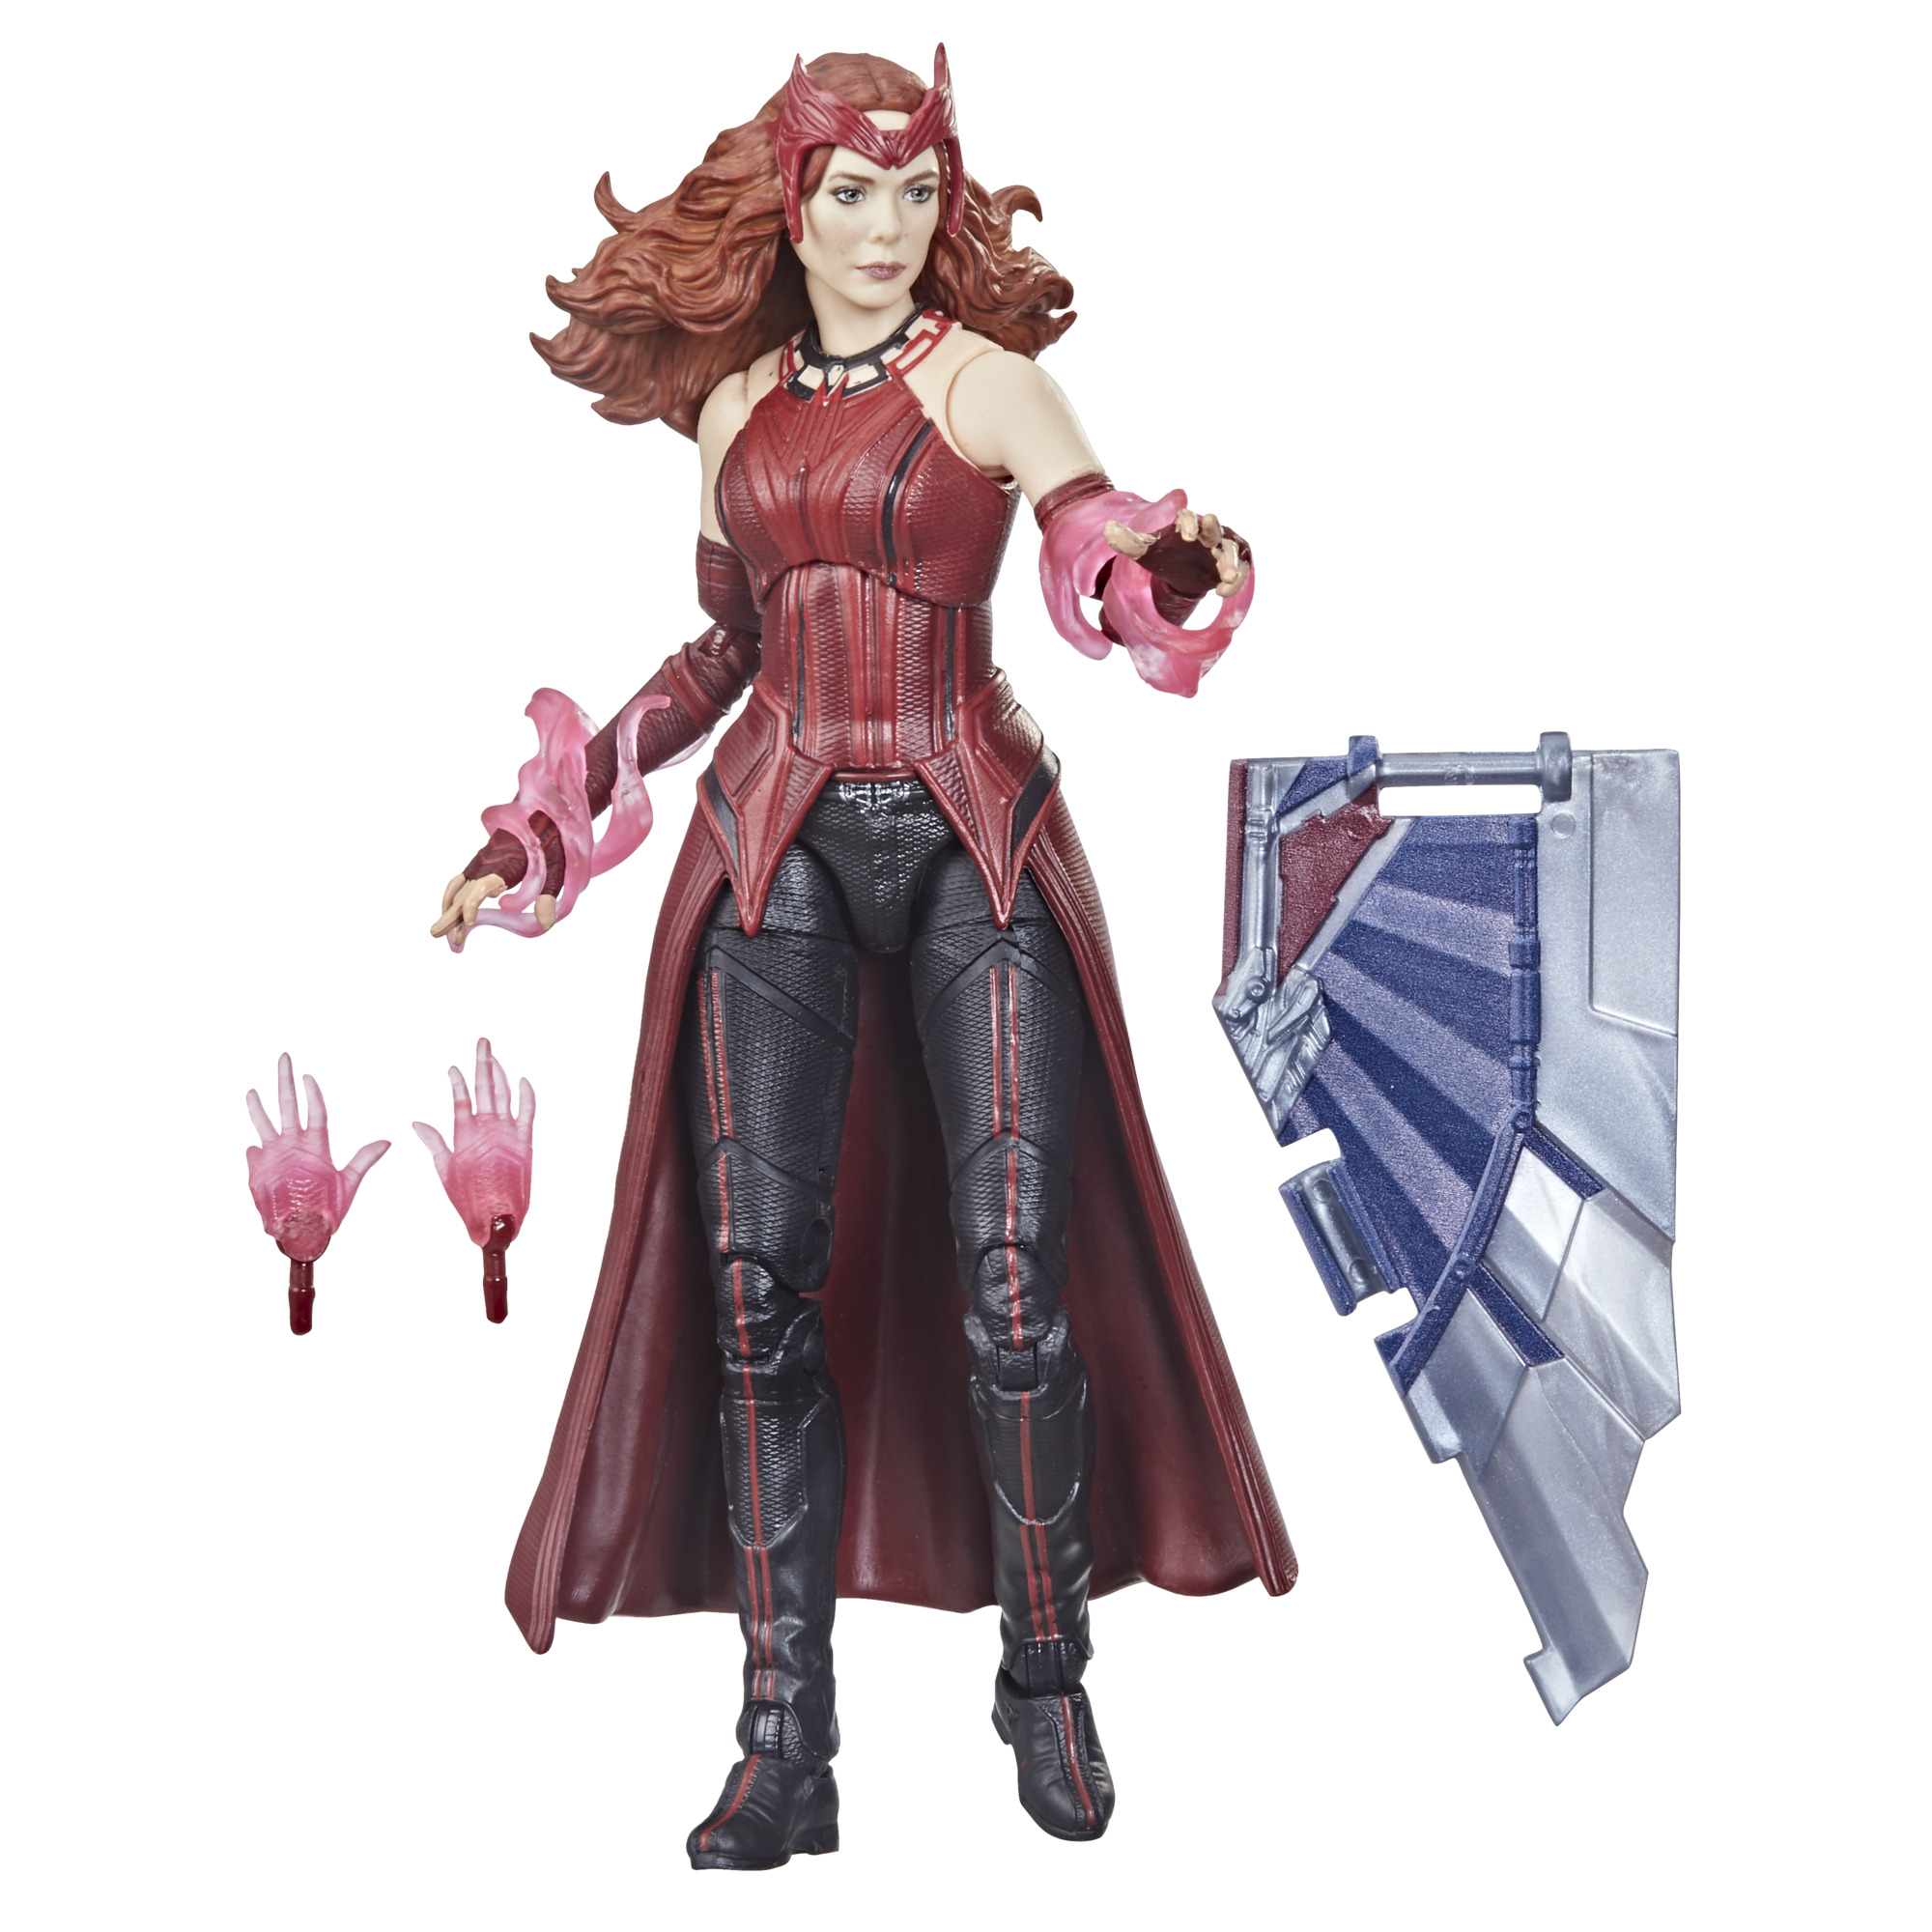 Marvel Legends Series Avengers Scarlet Witch Build a Figure F0324 5010993791132